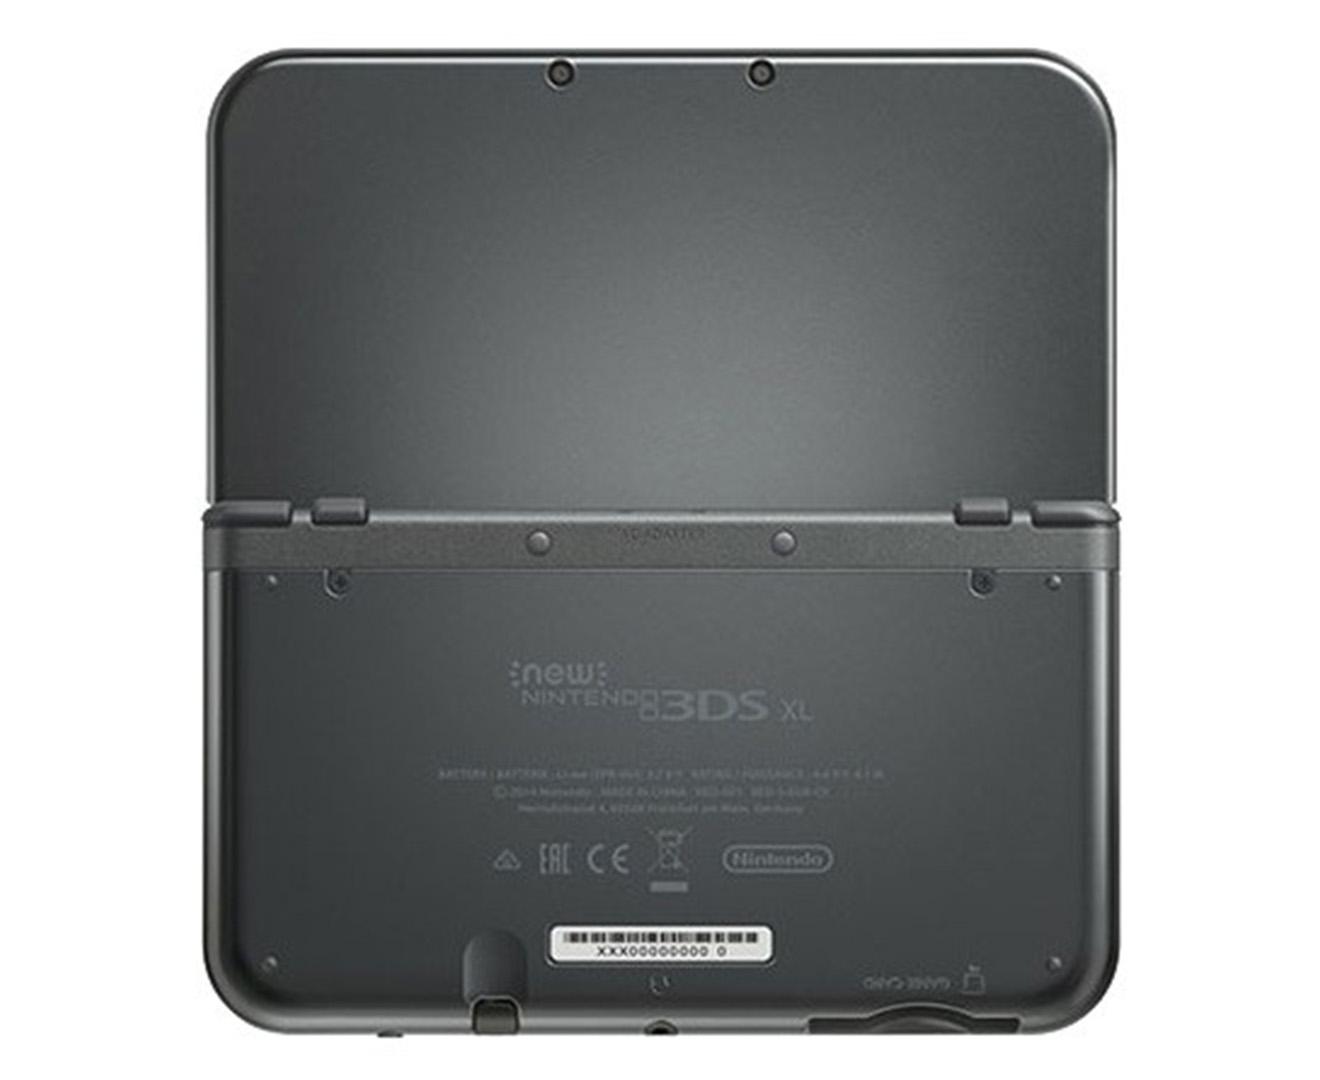 Nintendo 3ds Xl Game Console Metallic Black Catch Com Au